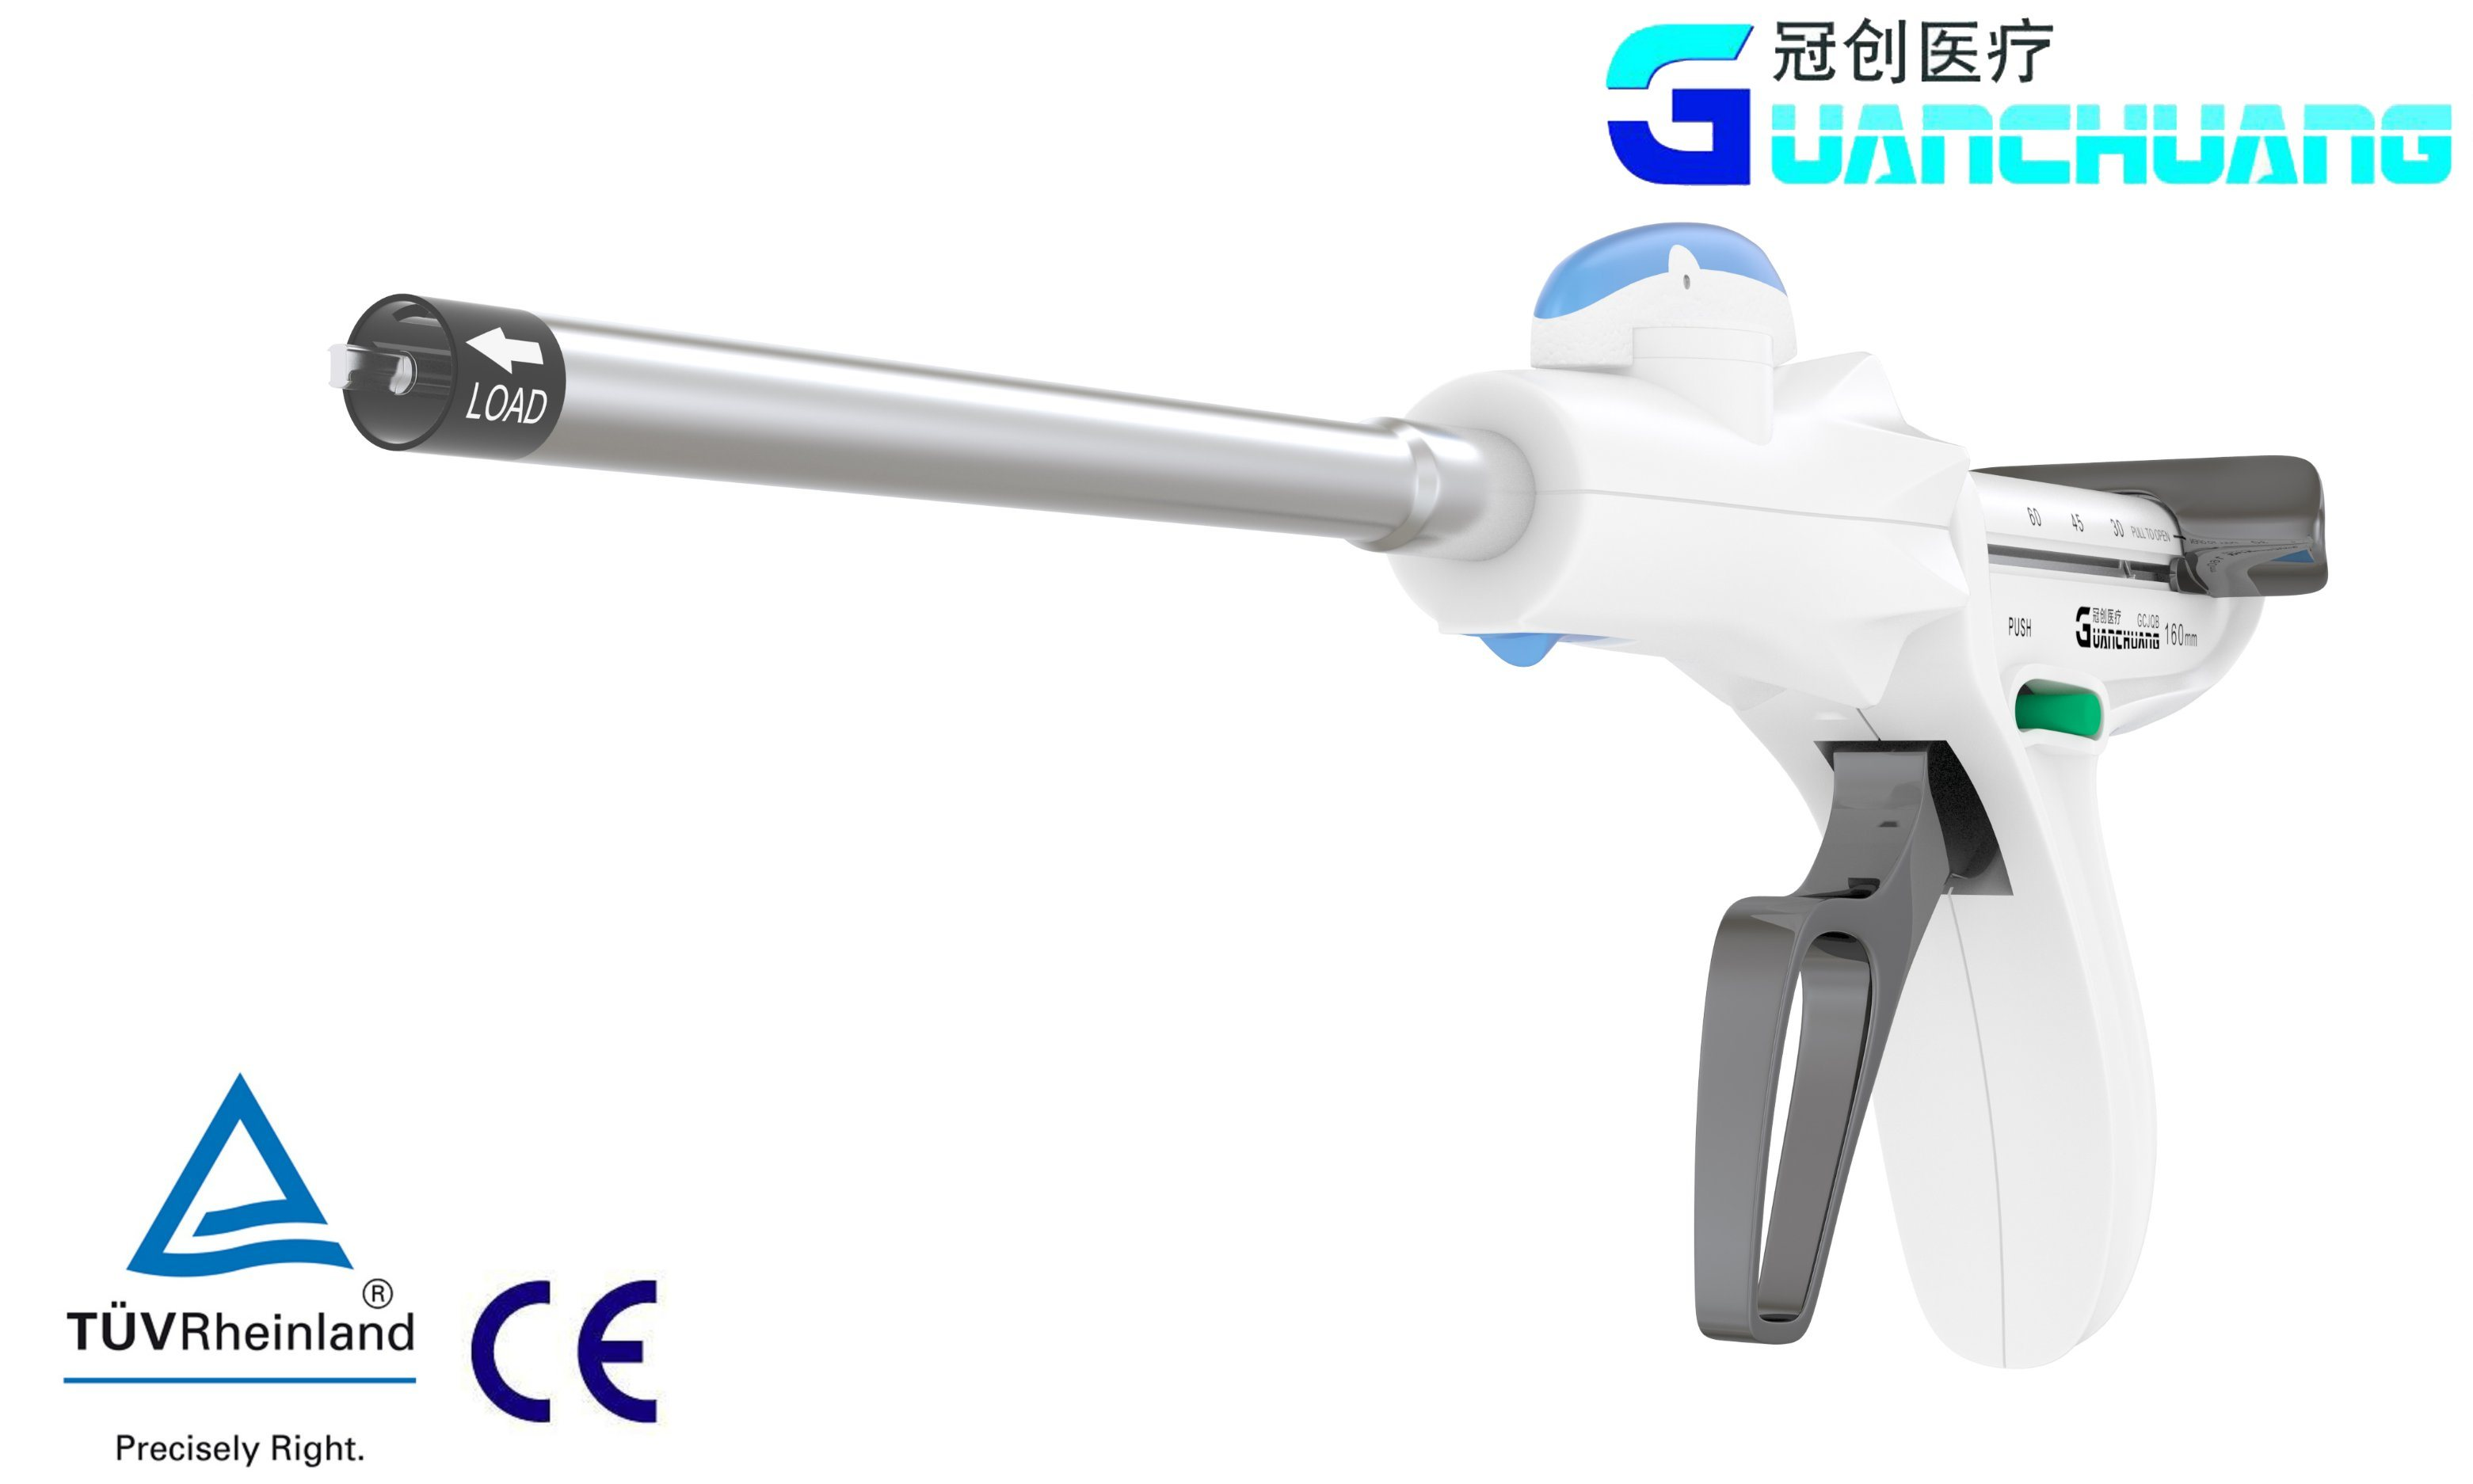 Reload for Endoscopic Cutter Stapler